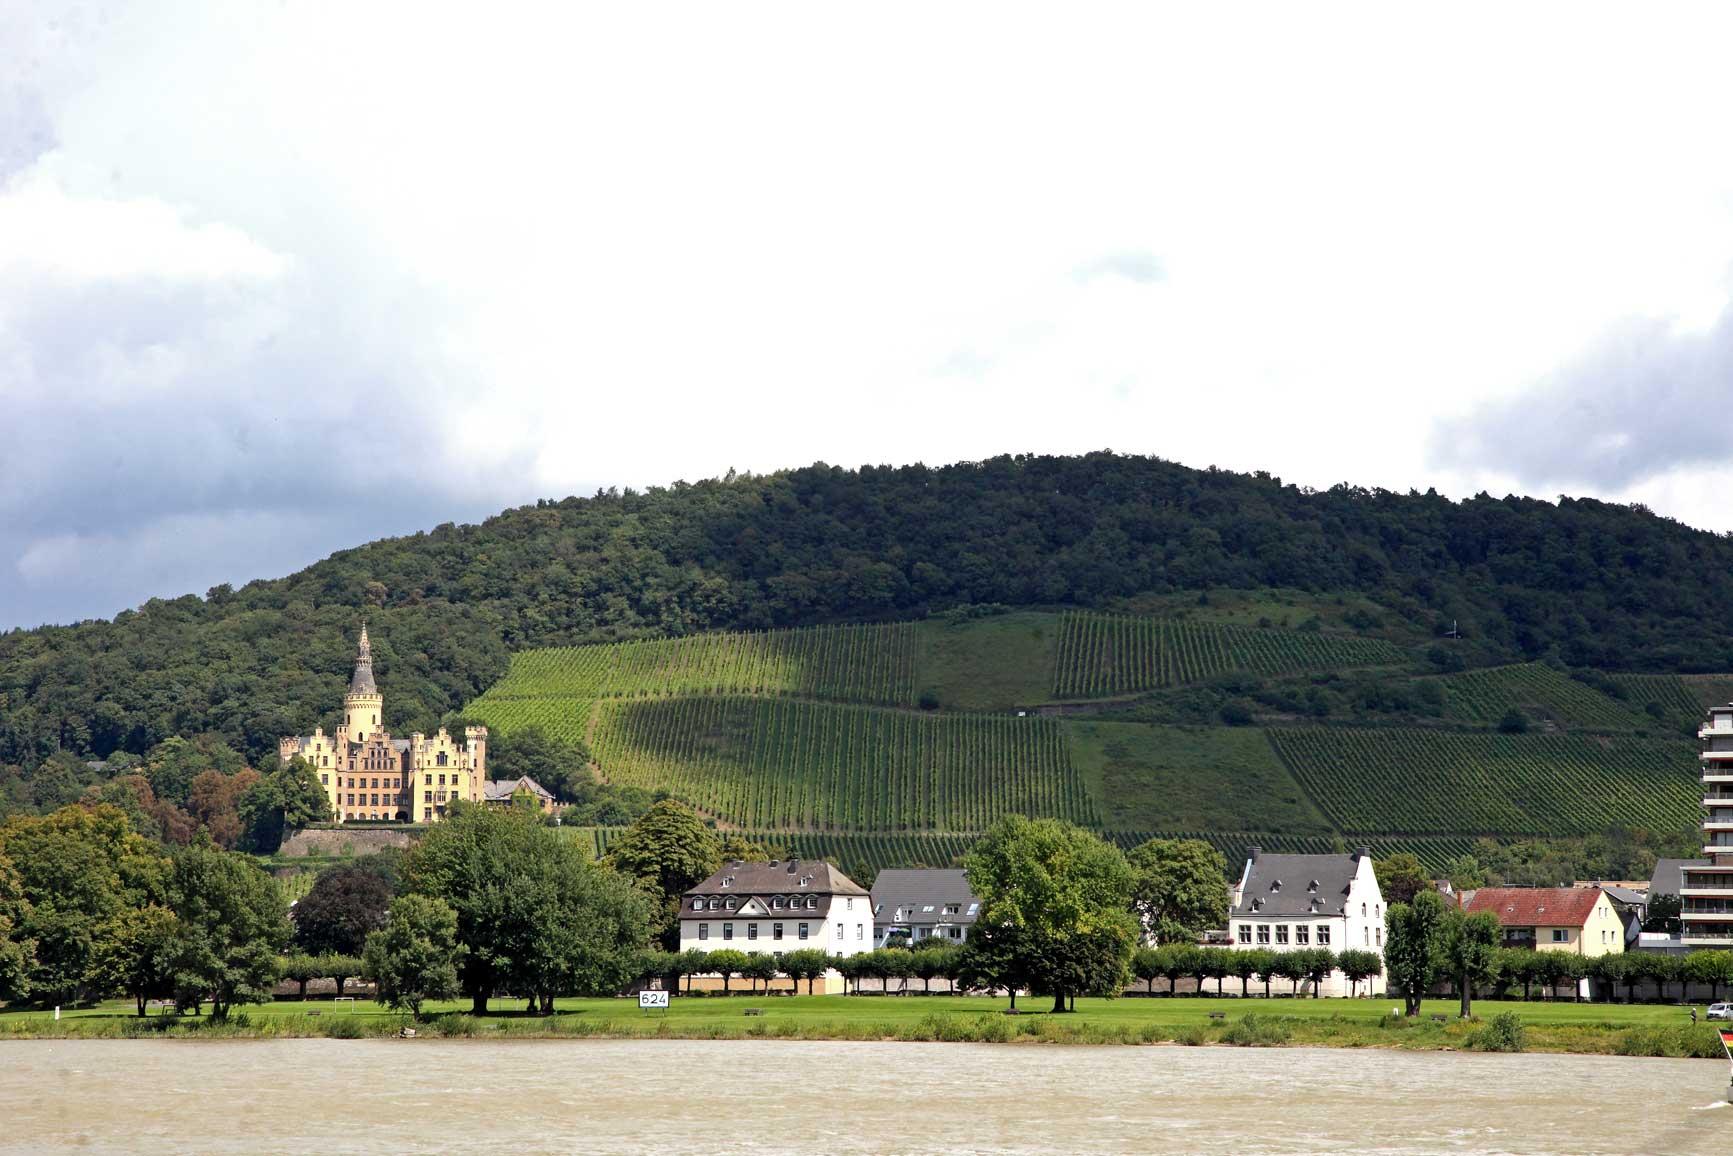 Rhine-16-08-14_15-01-41